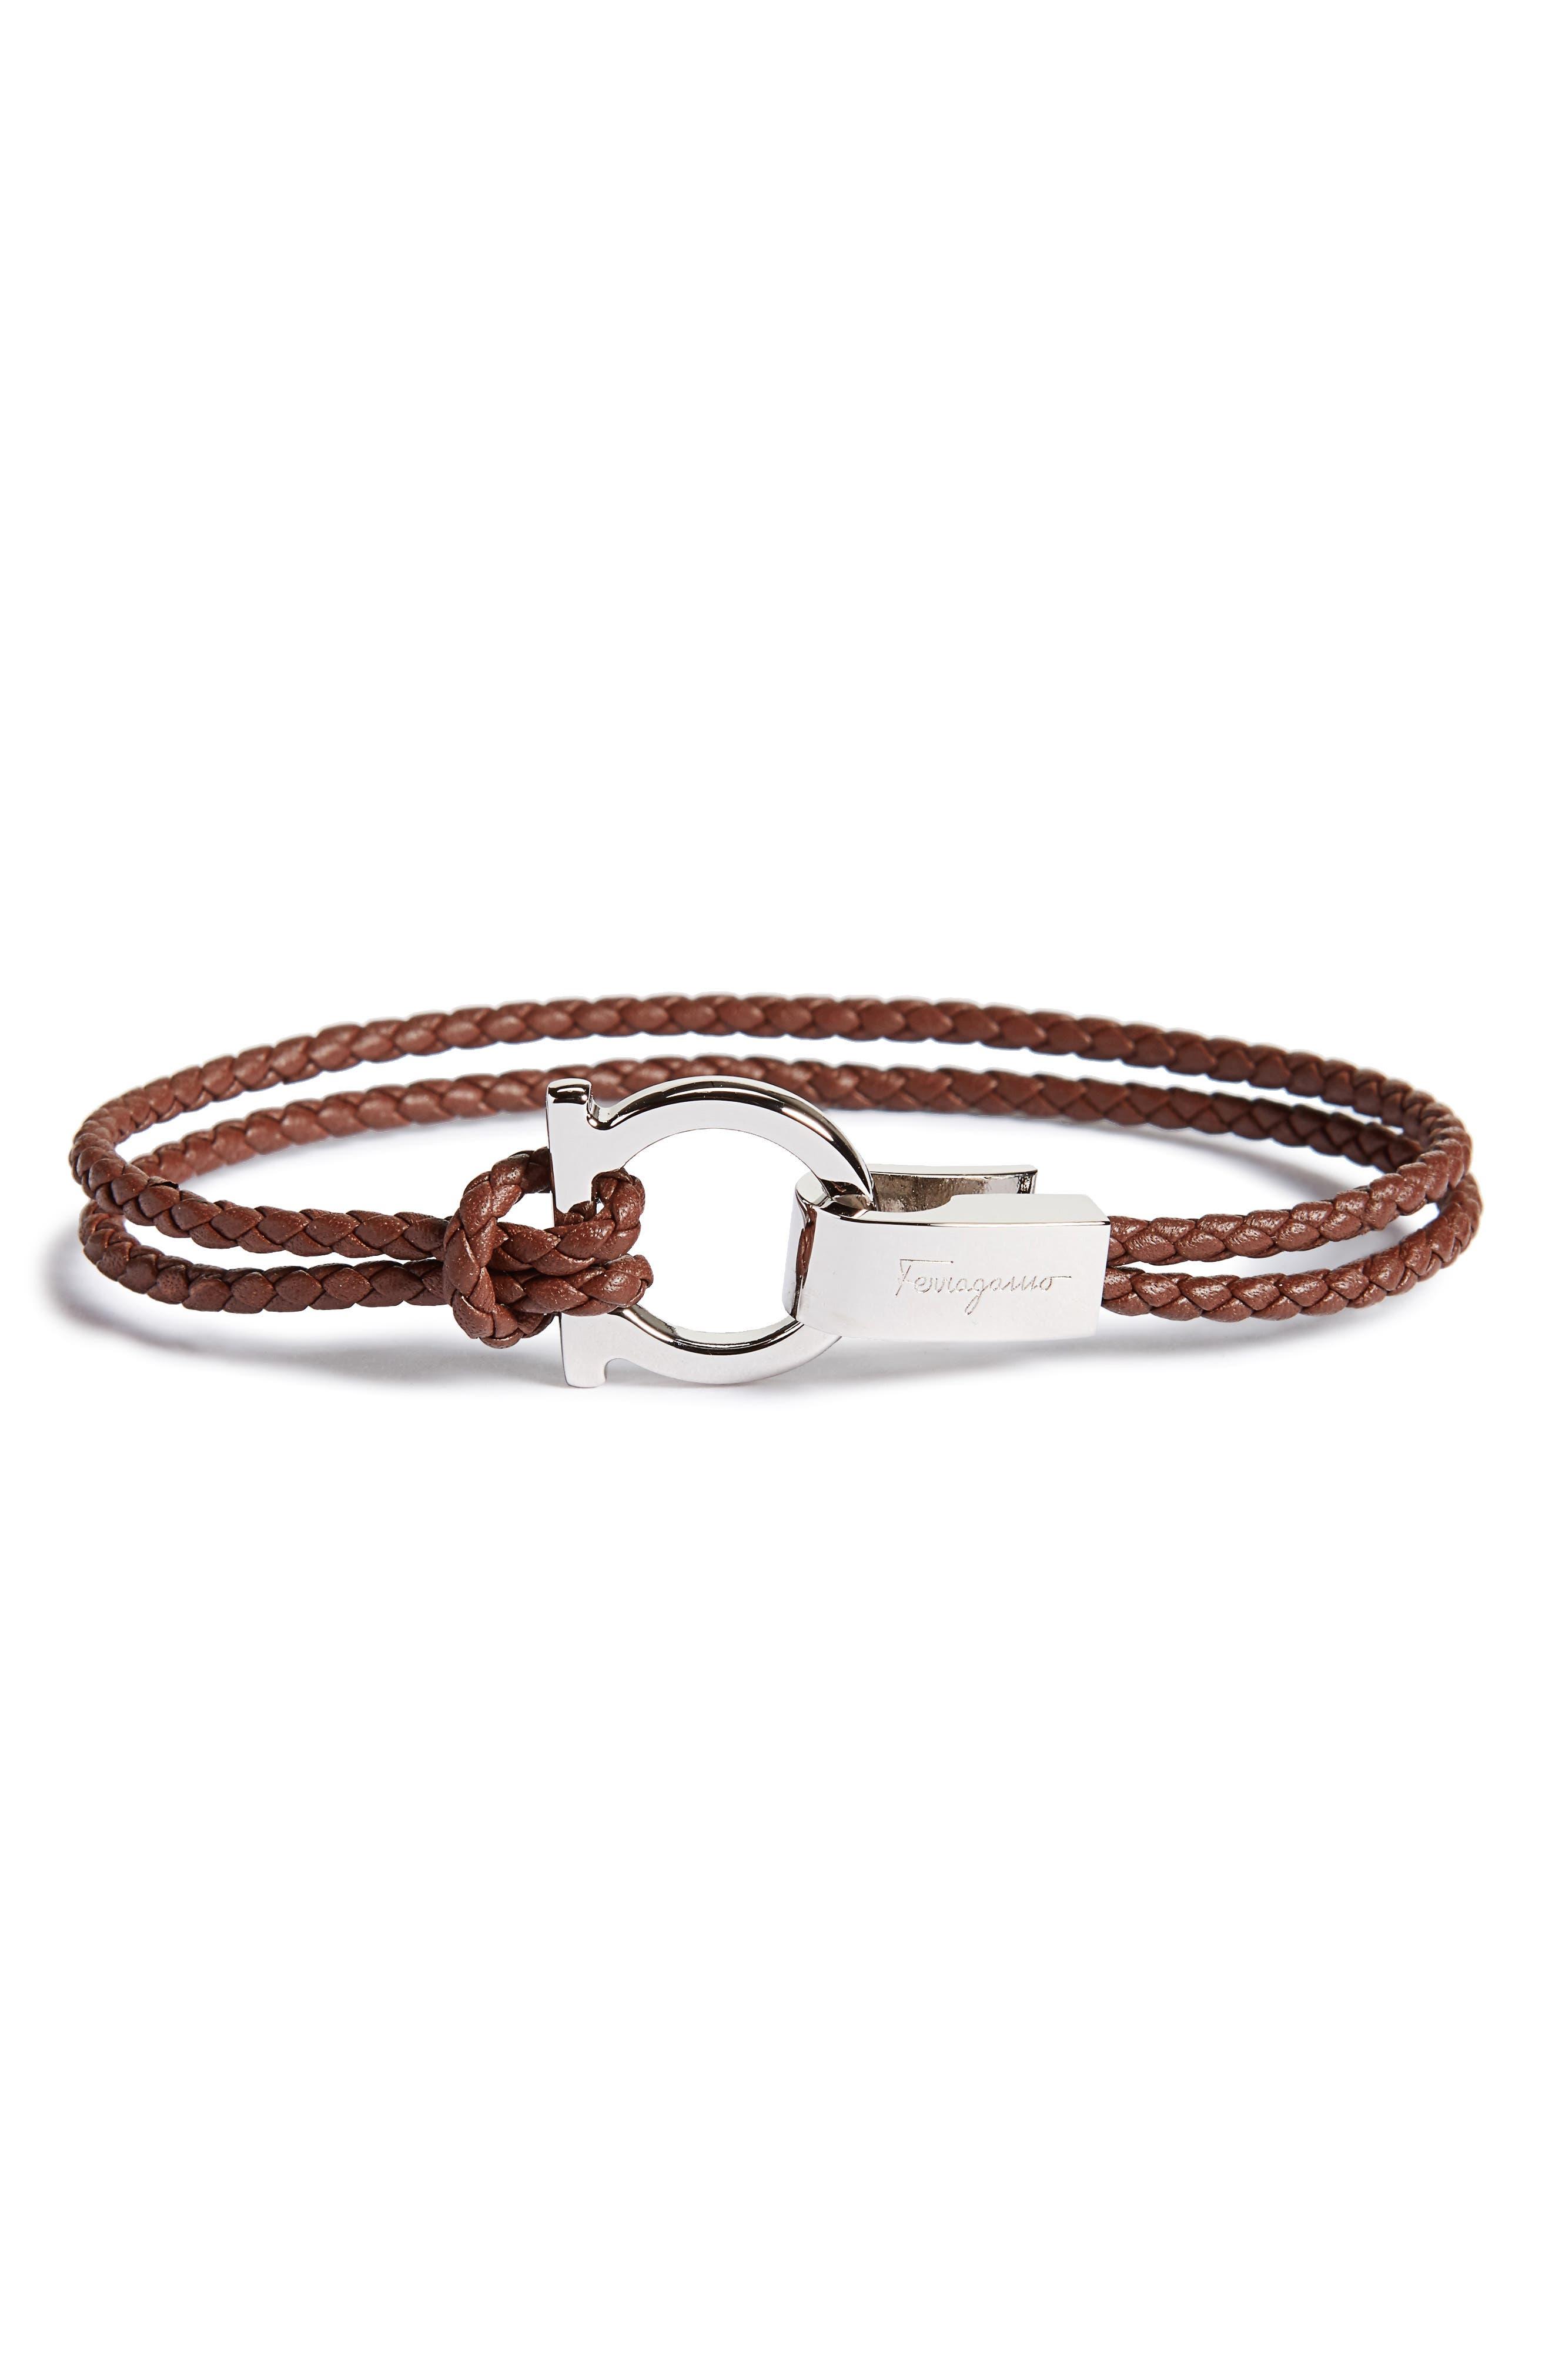 Double Braided Gancini Leather Bracelet,                             Main thumbnail 1, color,                             Bark Brown